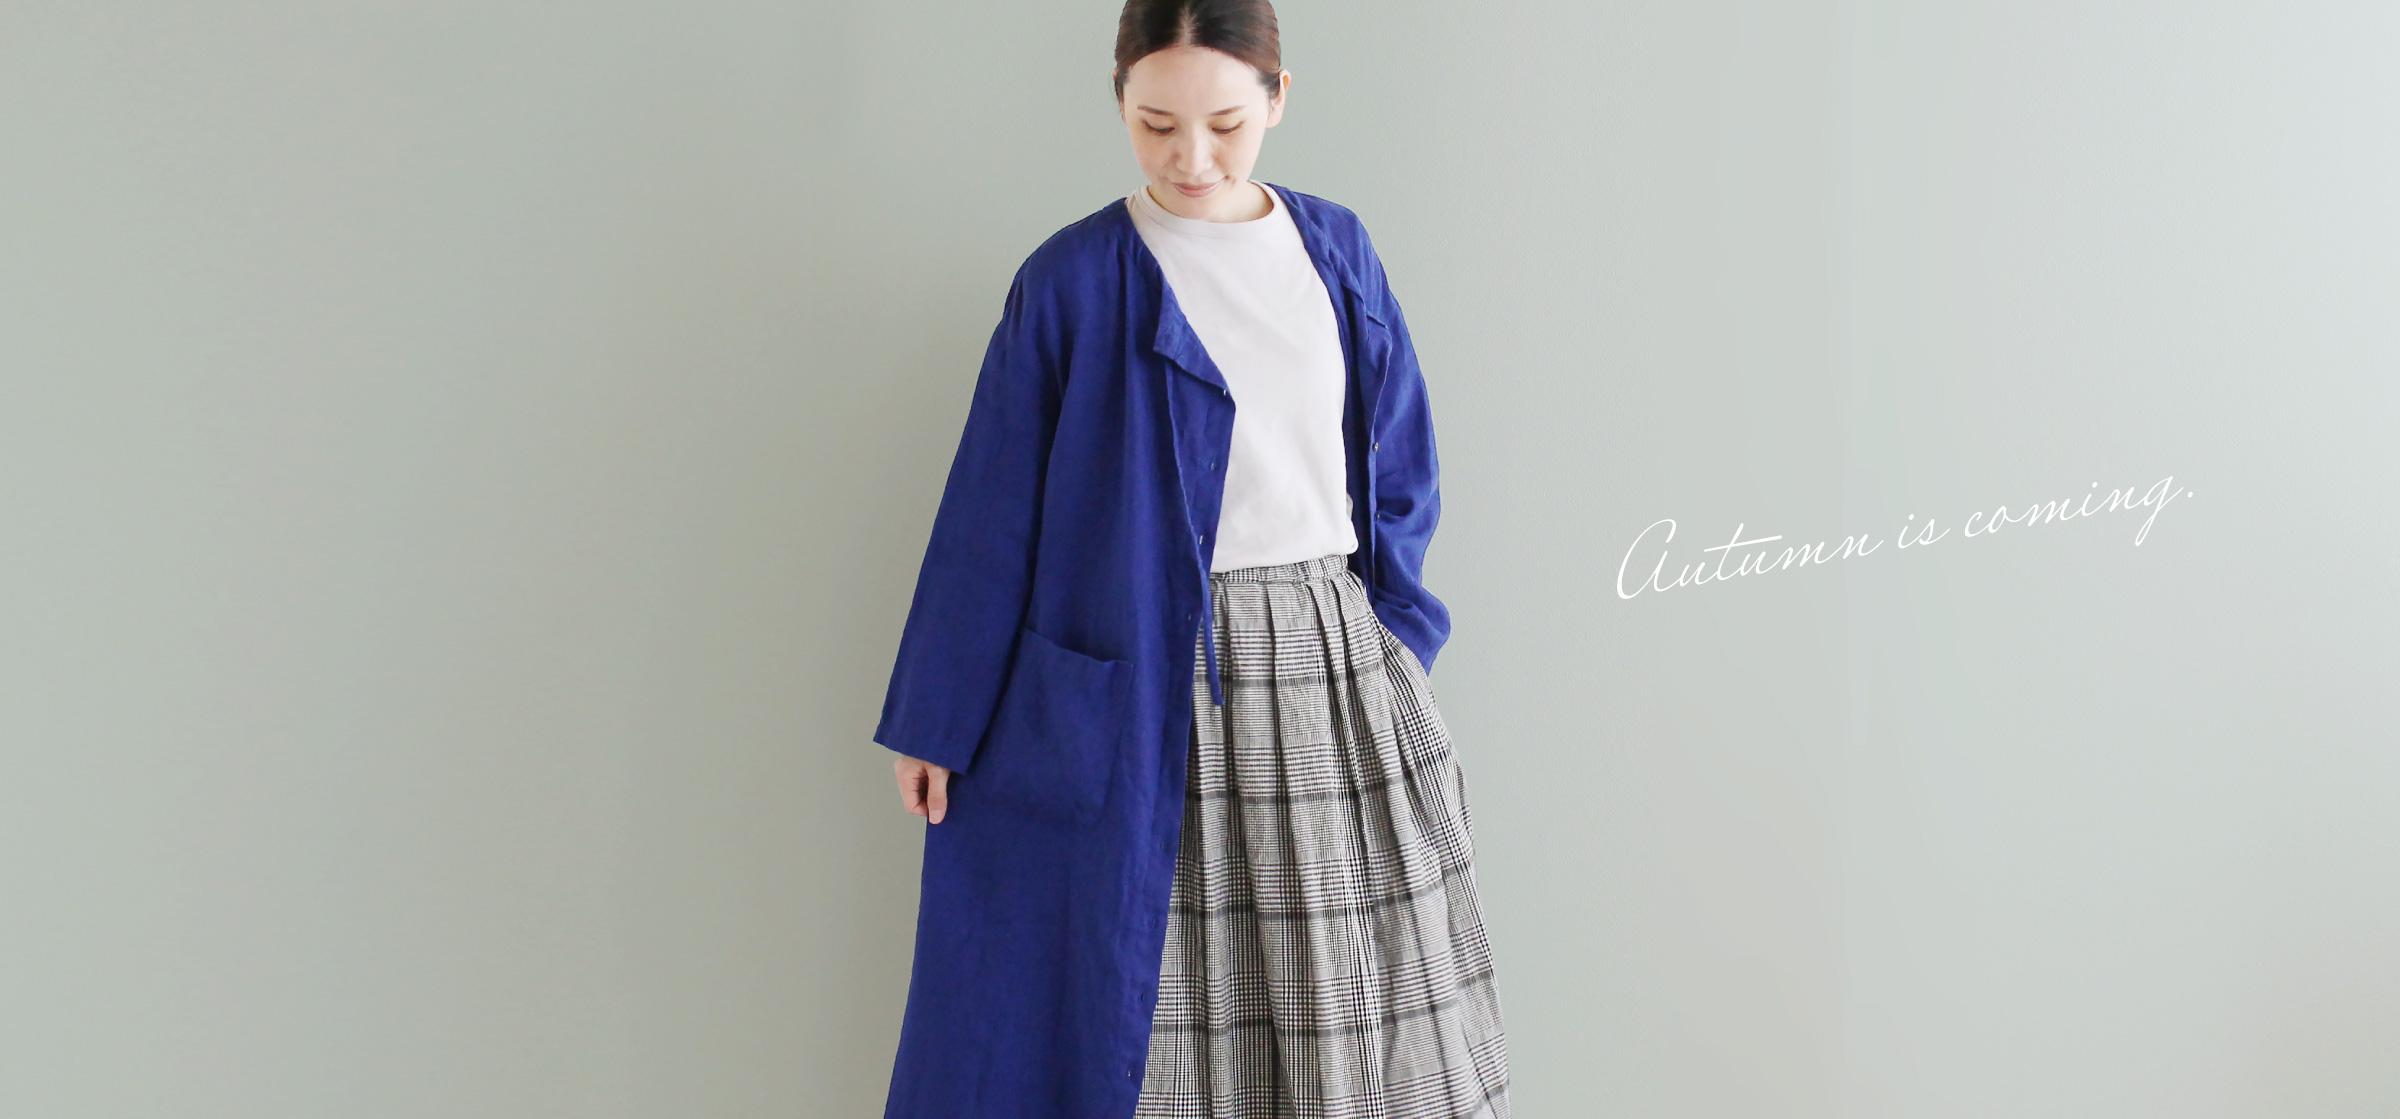 nofl 2021 autumn collection